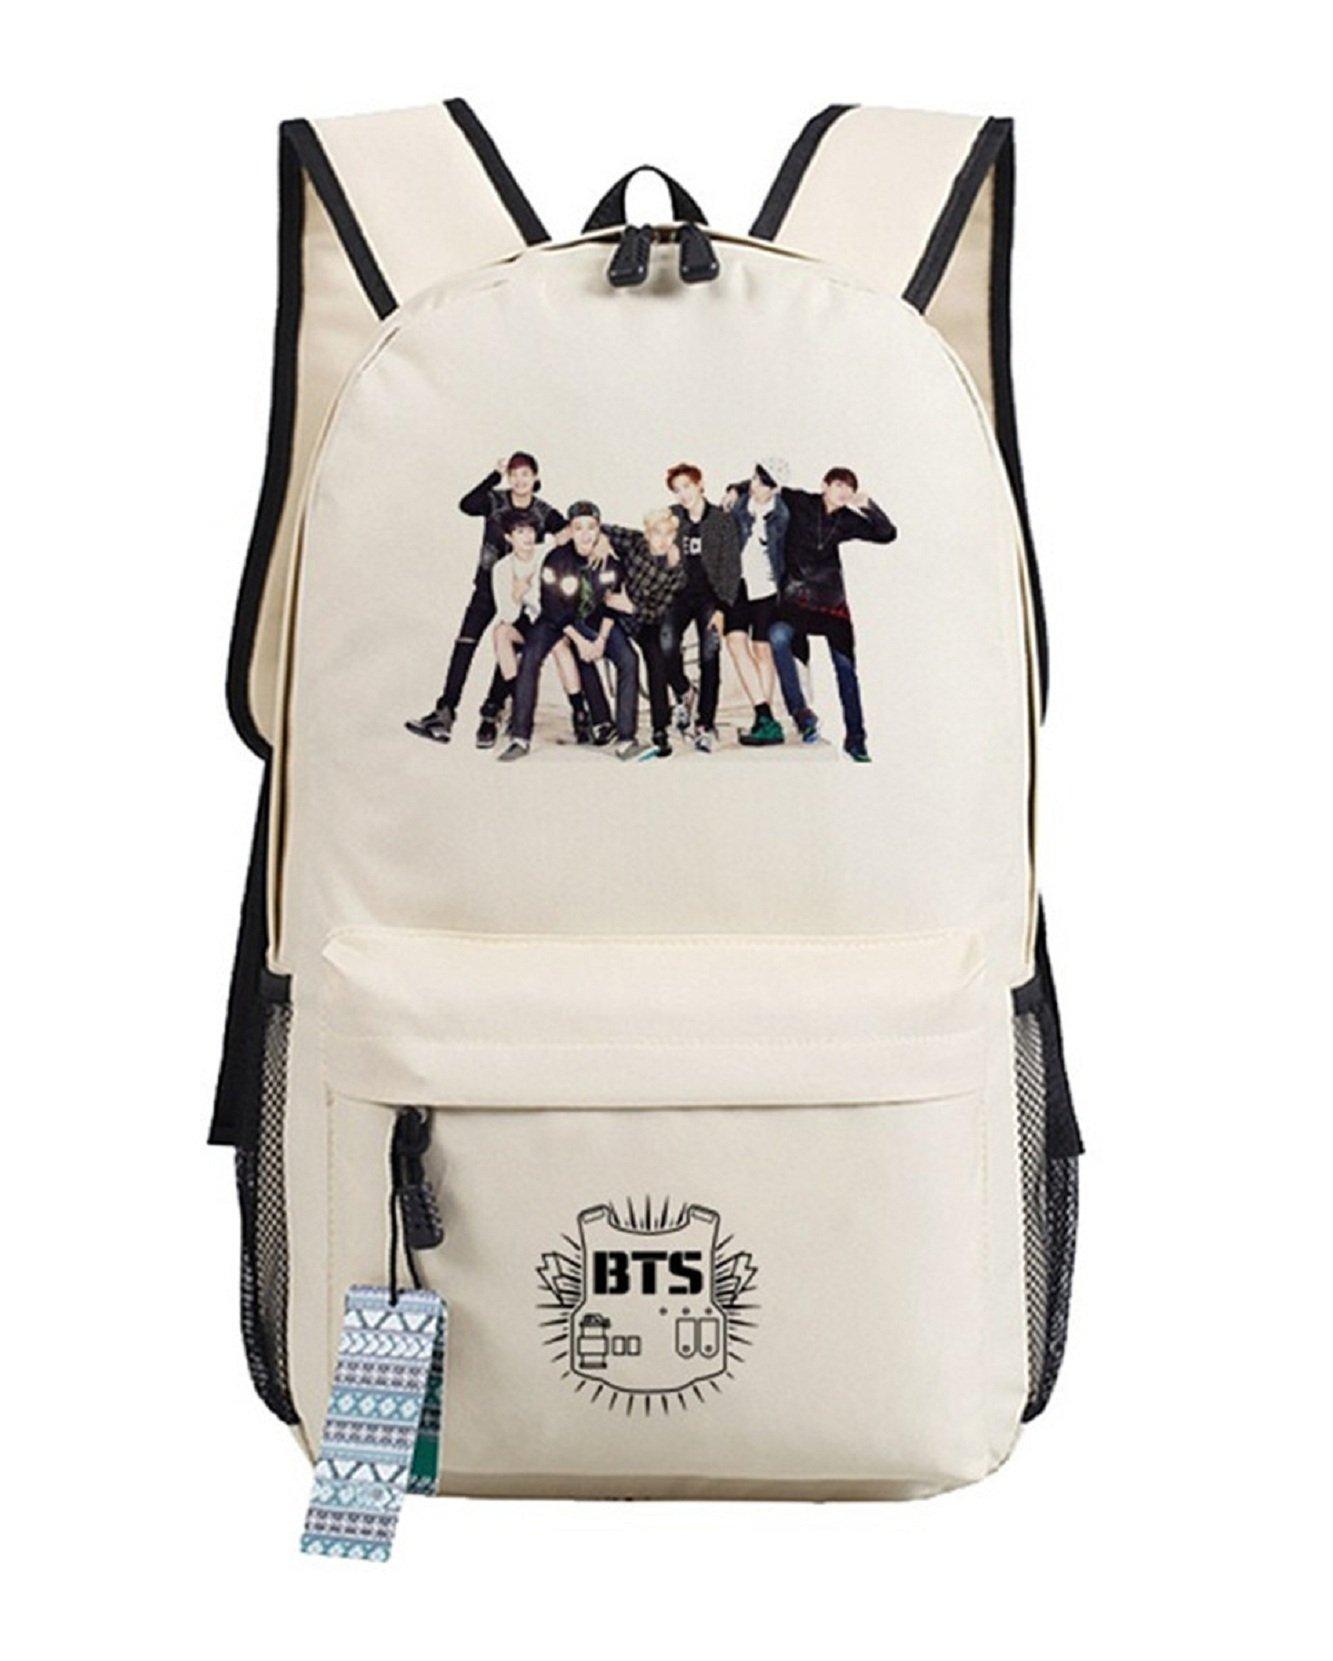 JUSTGOGO Korean Casual Backpack Daypack Laptop Bag College Bag Book Bag School Bag (Beige 2)